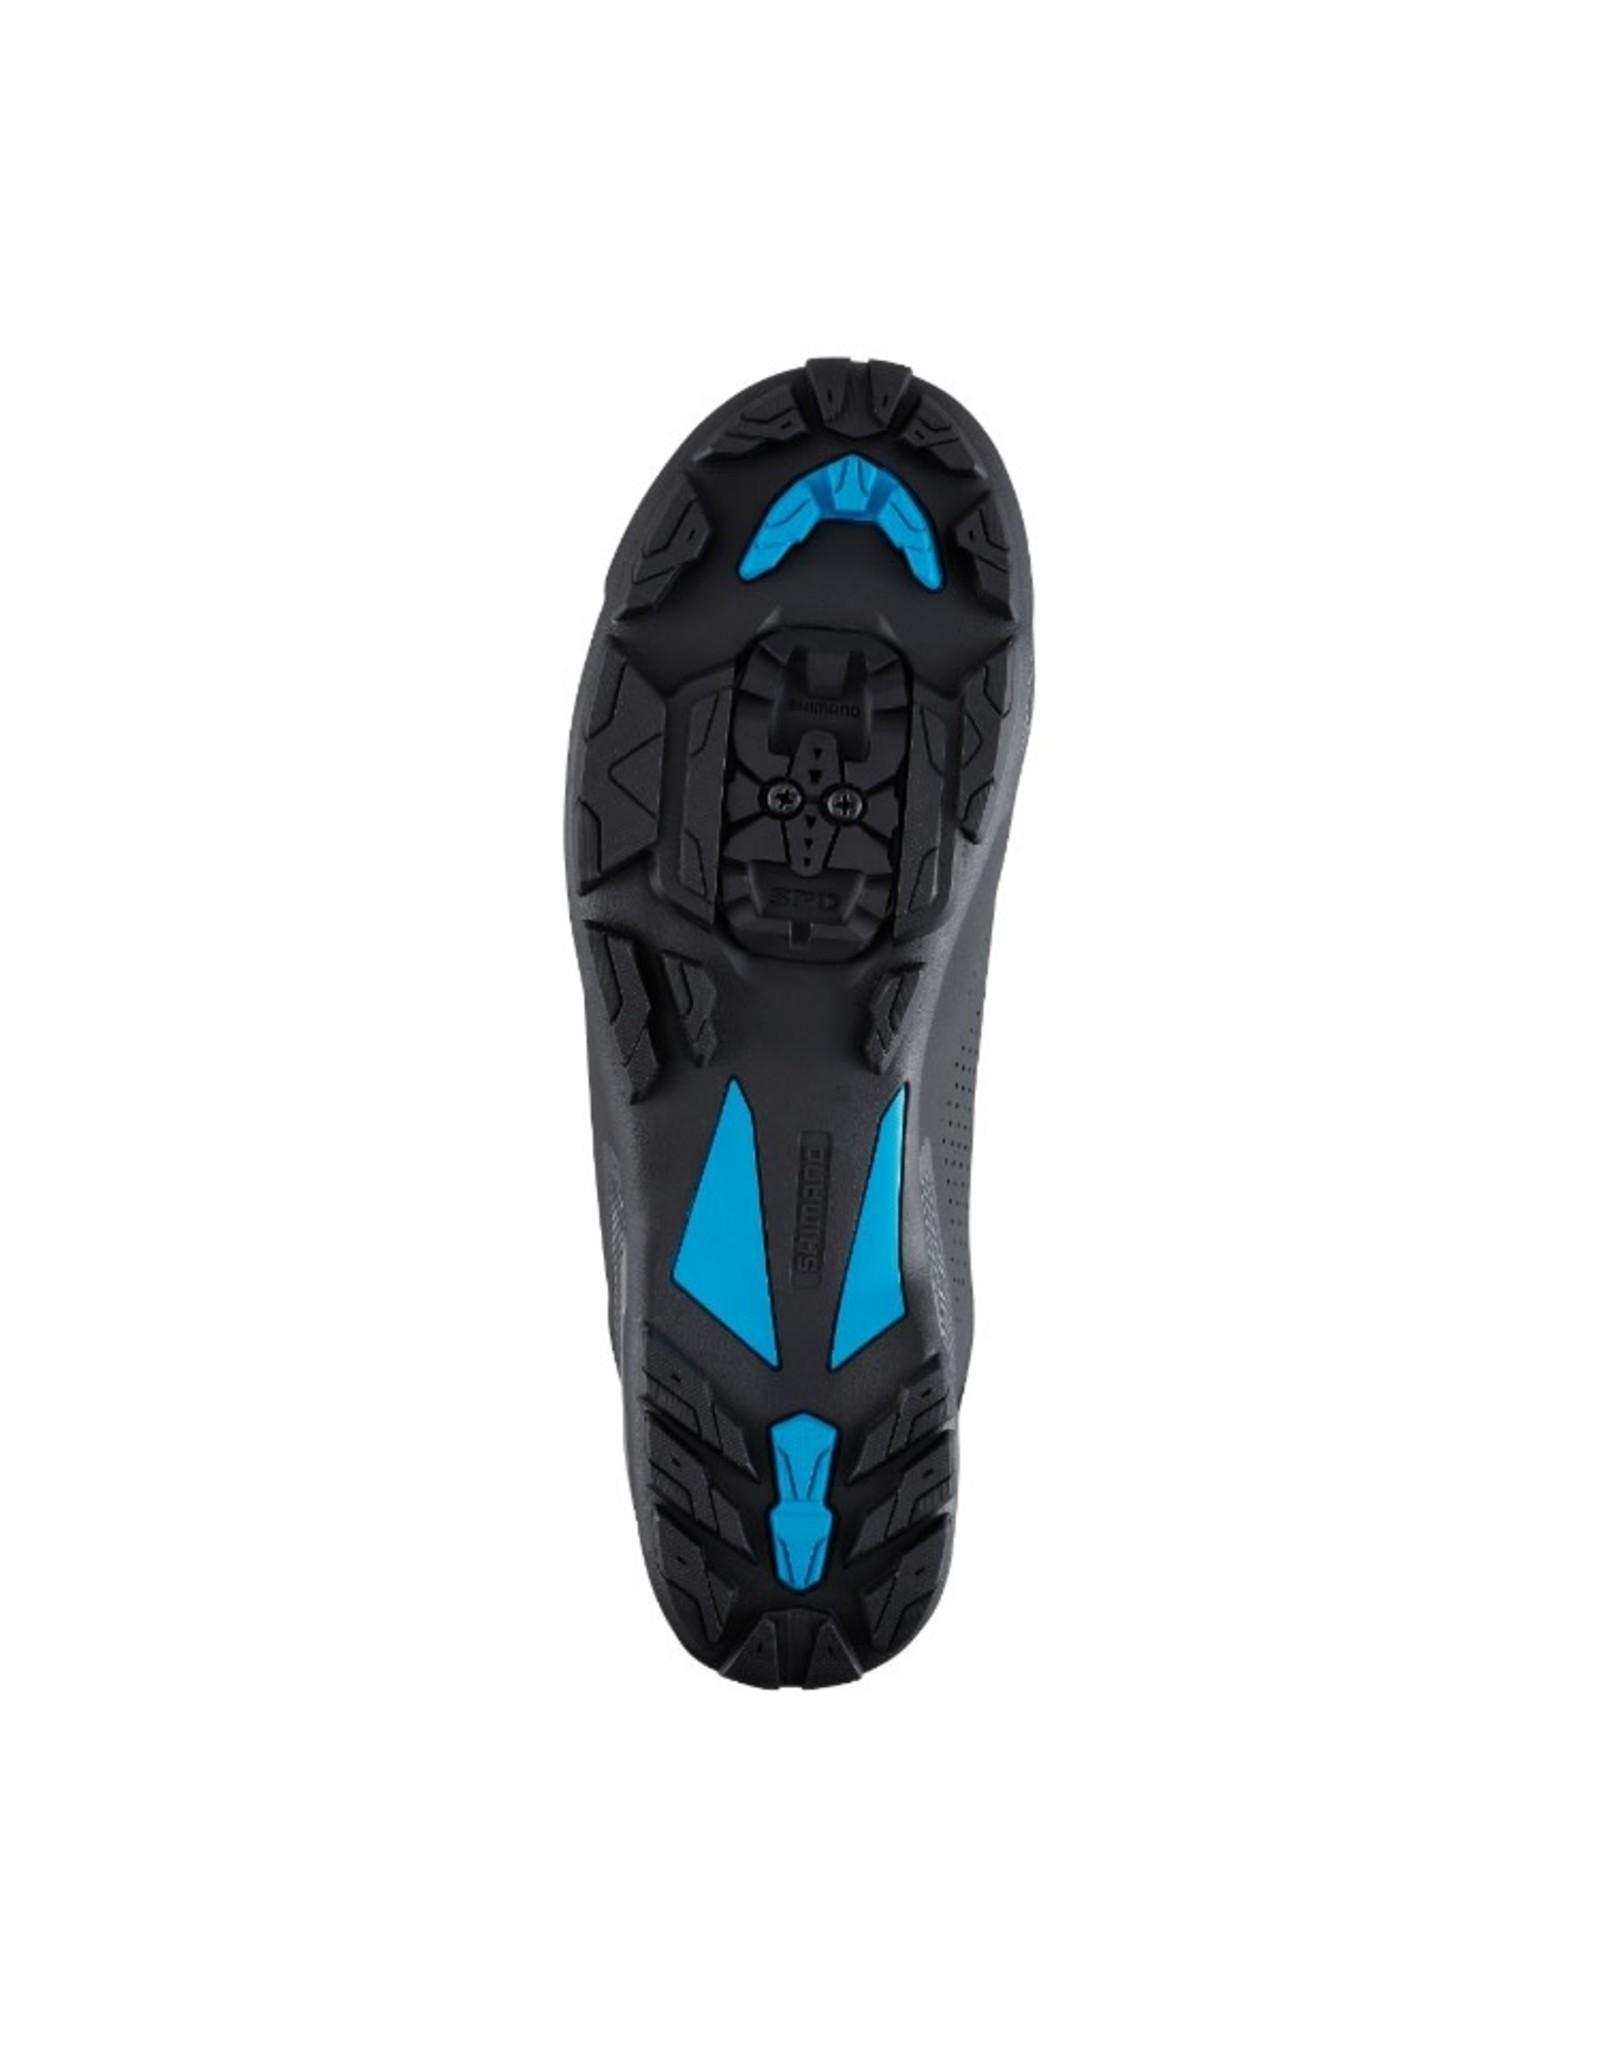 Shimano MT301 MTB/Touring Shoe